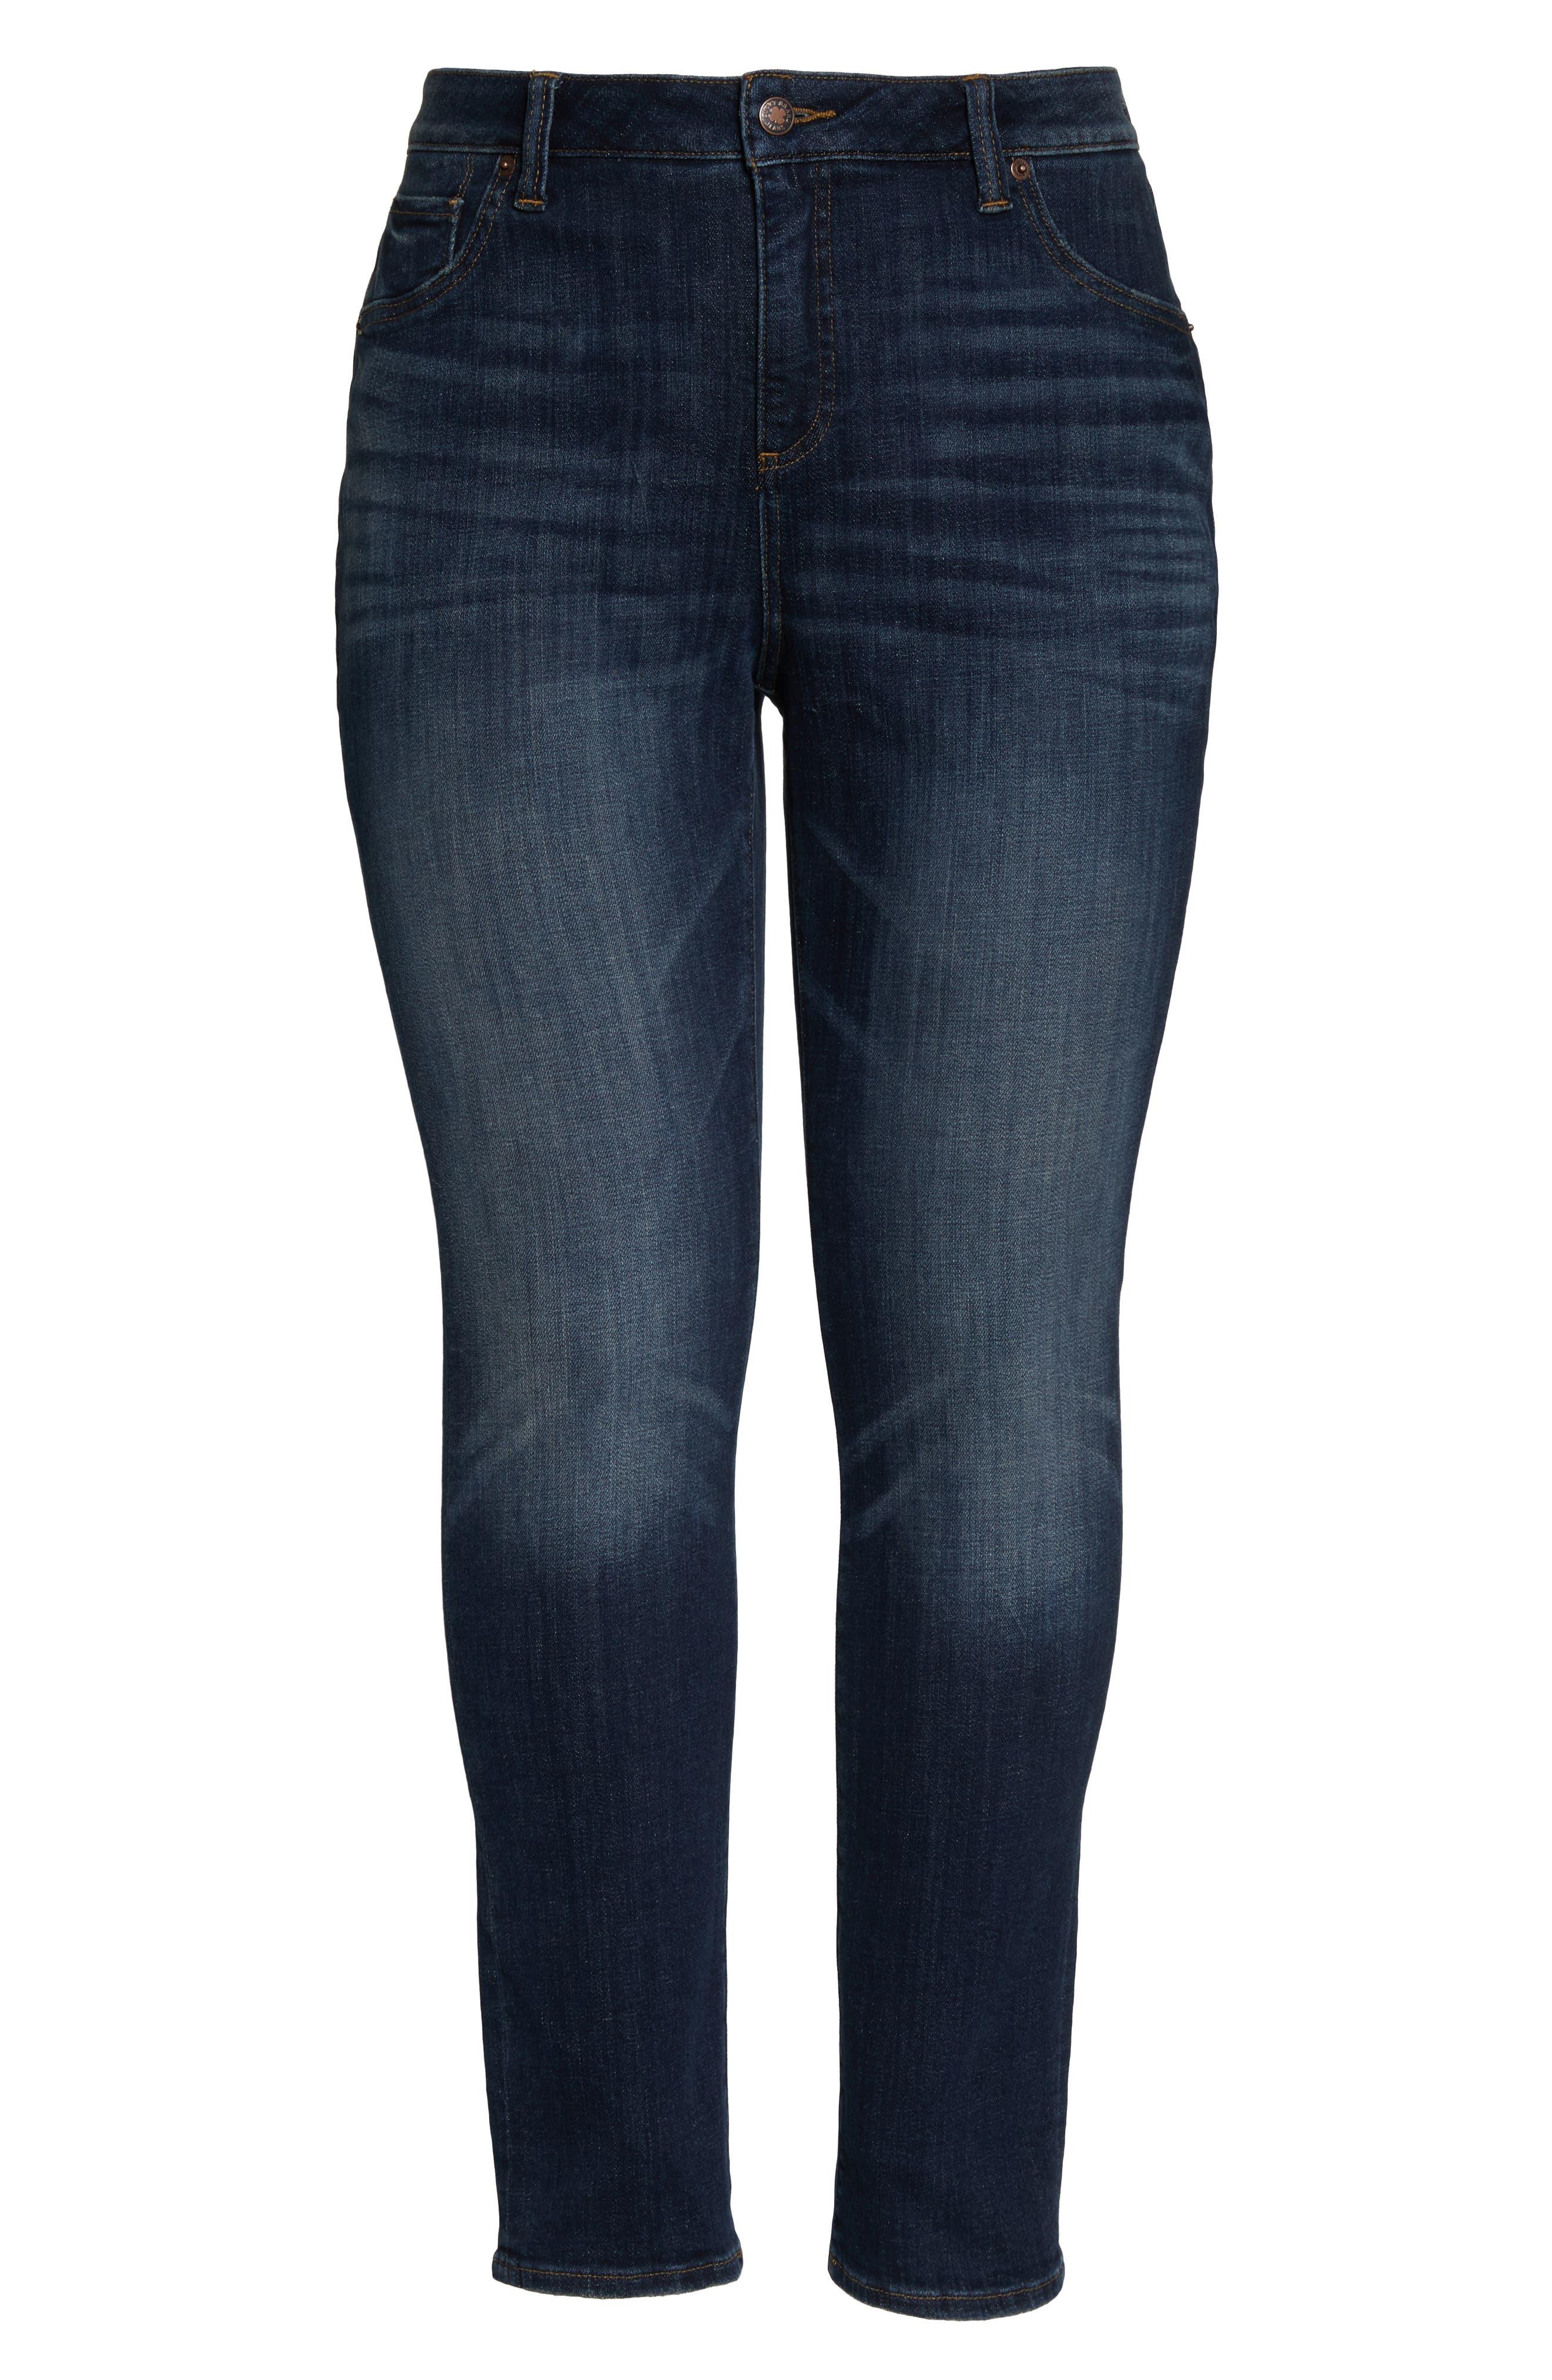 LUCKY BRAND, Emma High Rise Stretch Straight Leg Jeans, Alternate thumbnail 2, color, TIBURON